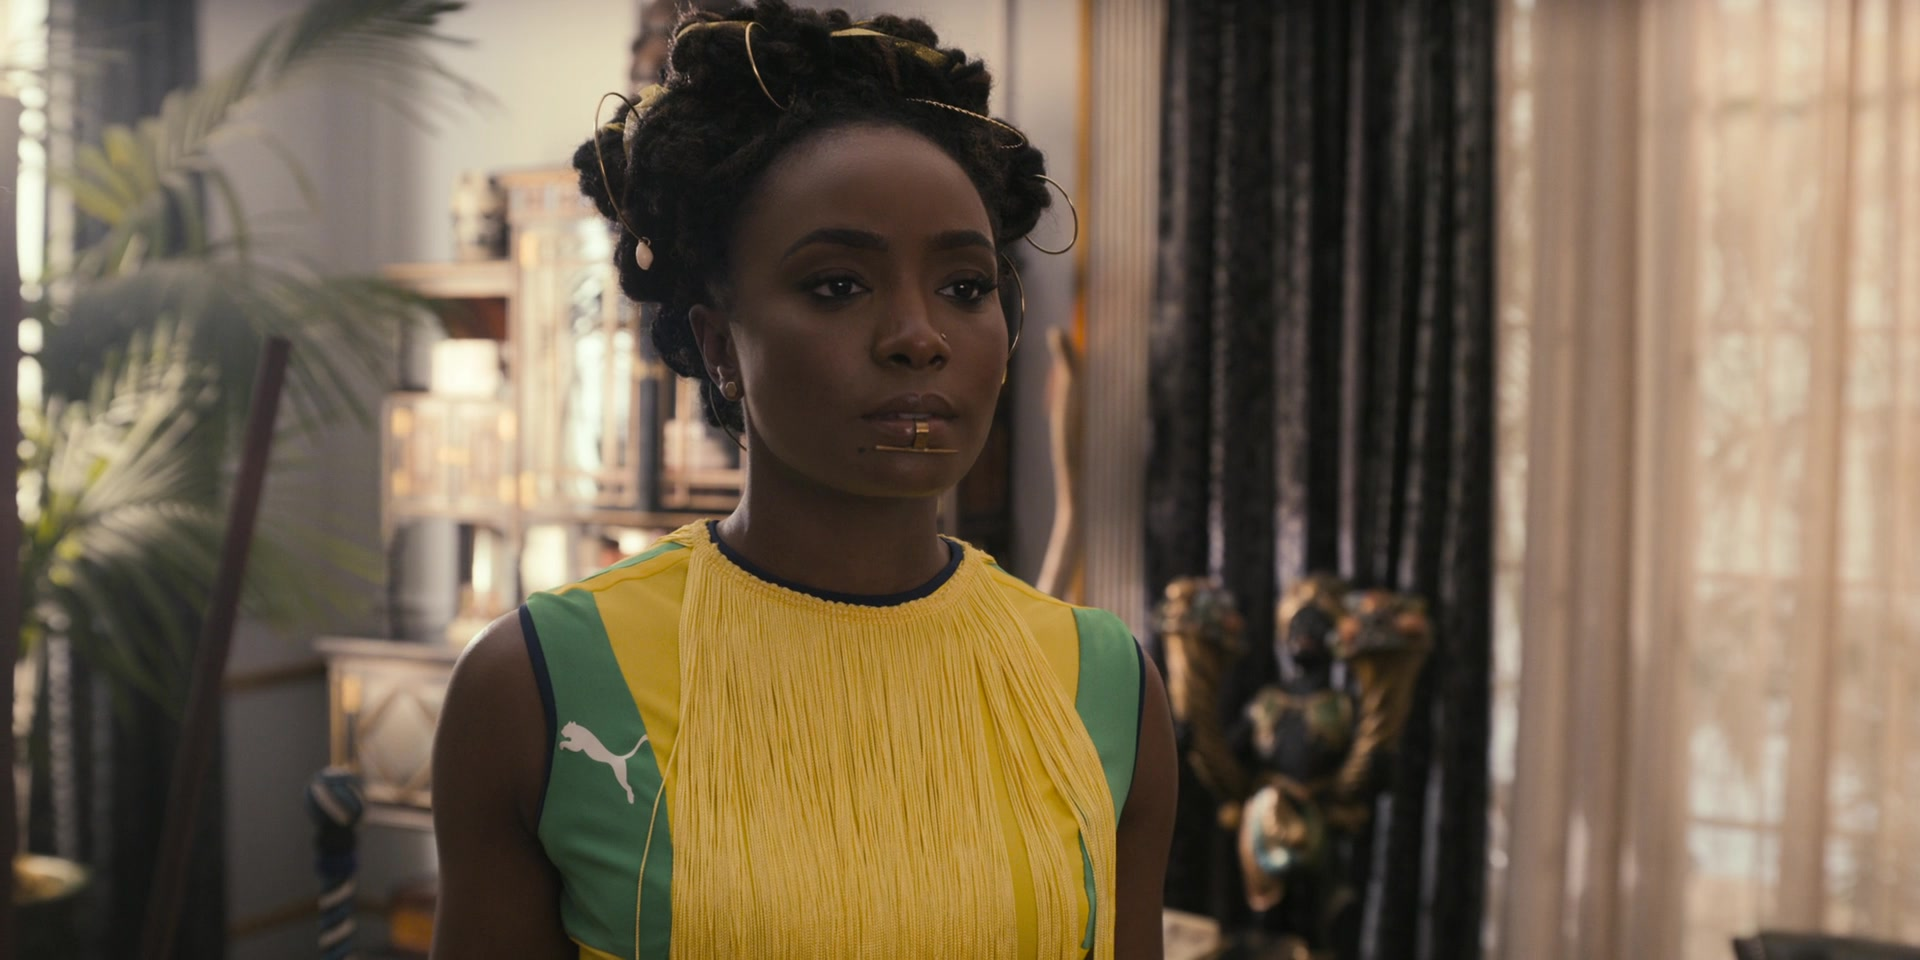 Puma Dress Of KiKi Layne As Princess Meeka Joffer In Coming 2 America (2021)